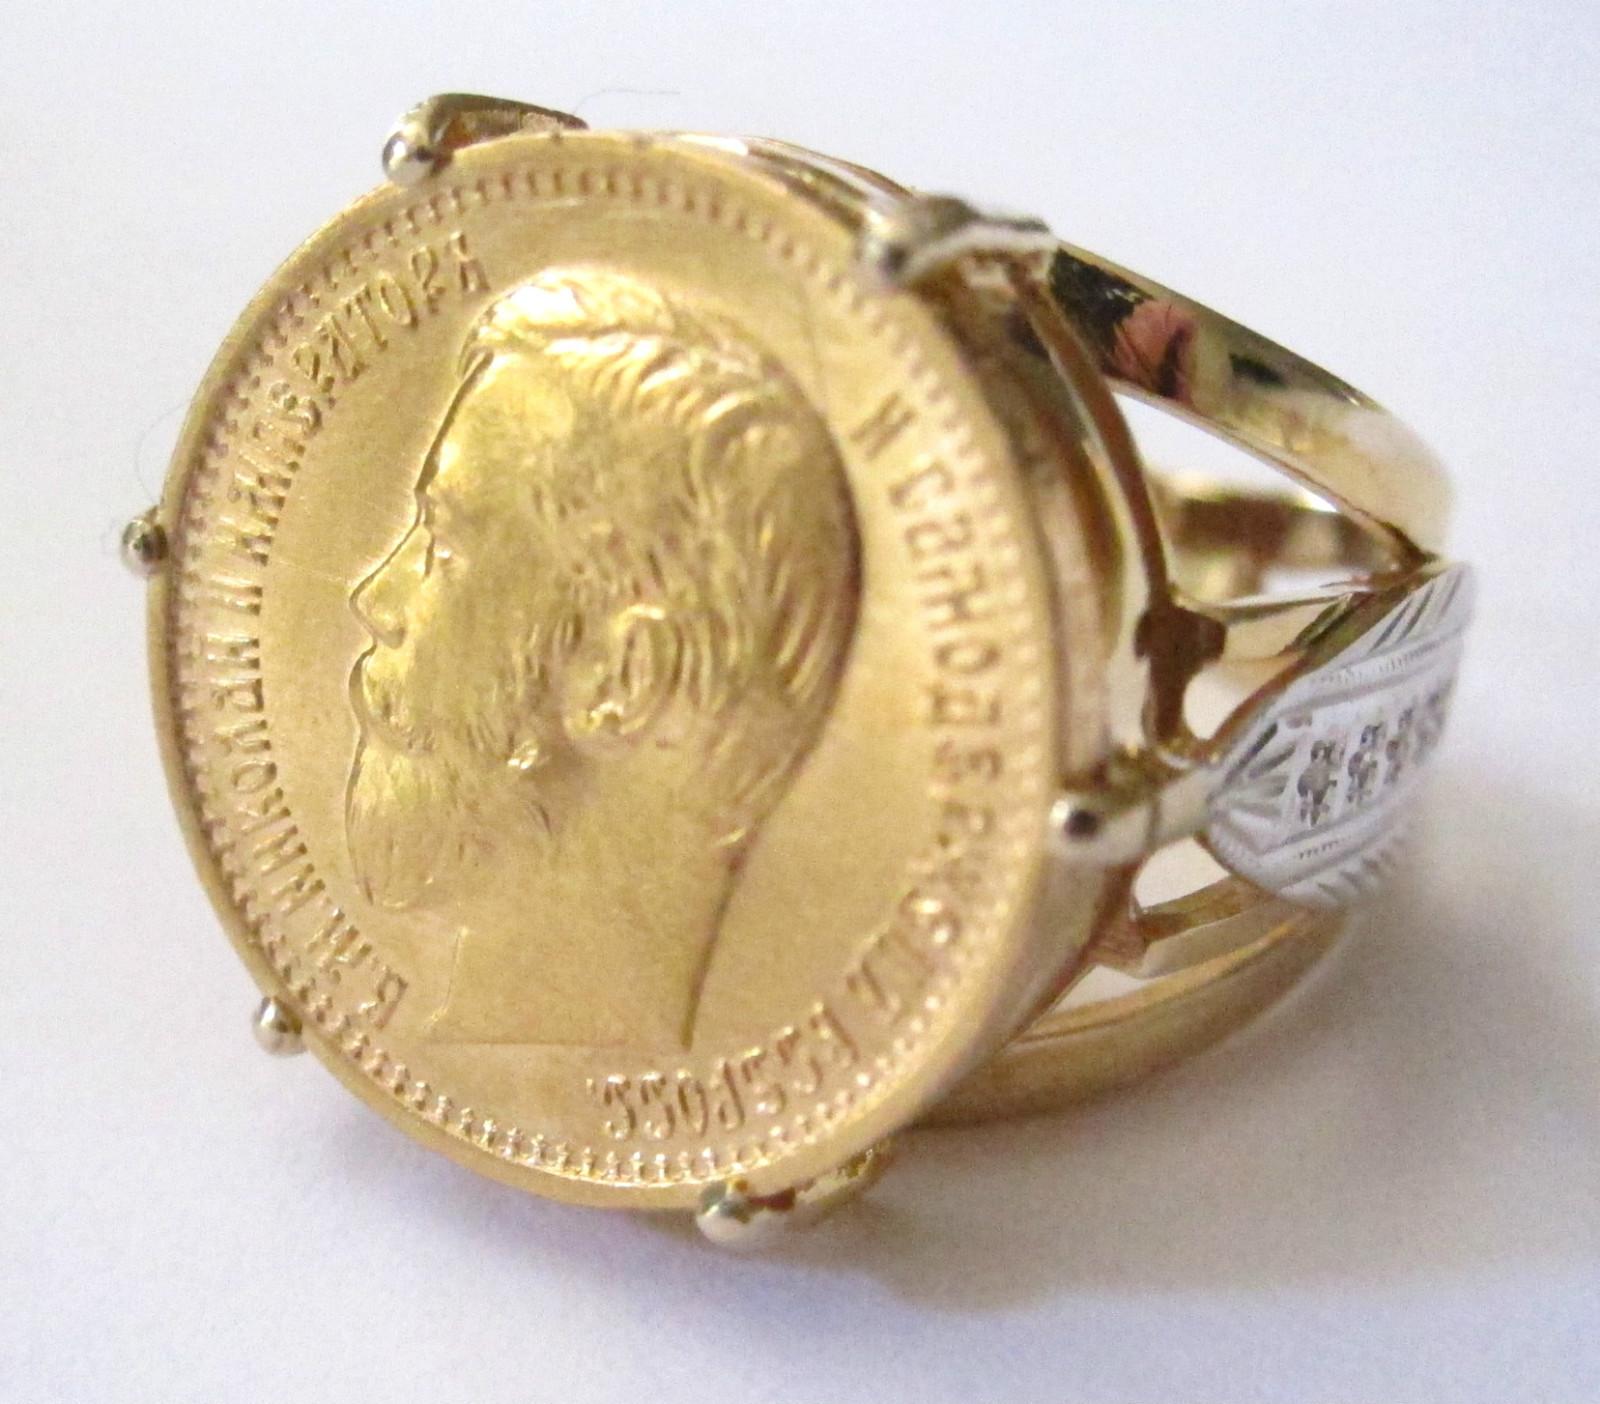 http://klads.org/wp-content/uploads/2013/05/ring-coin____klads-org____0046.jpg